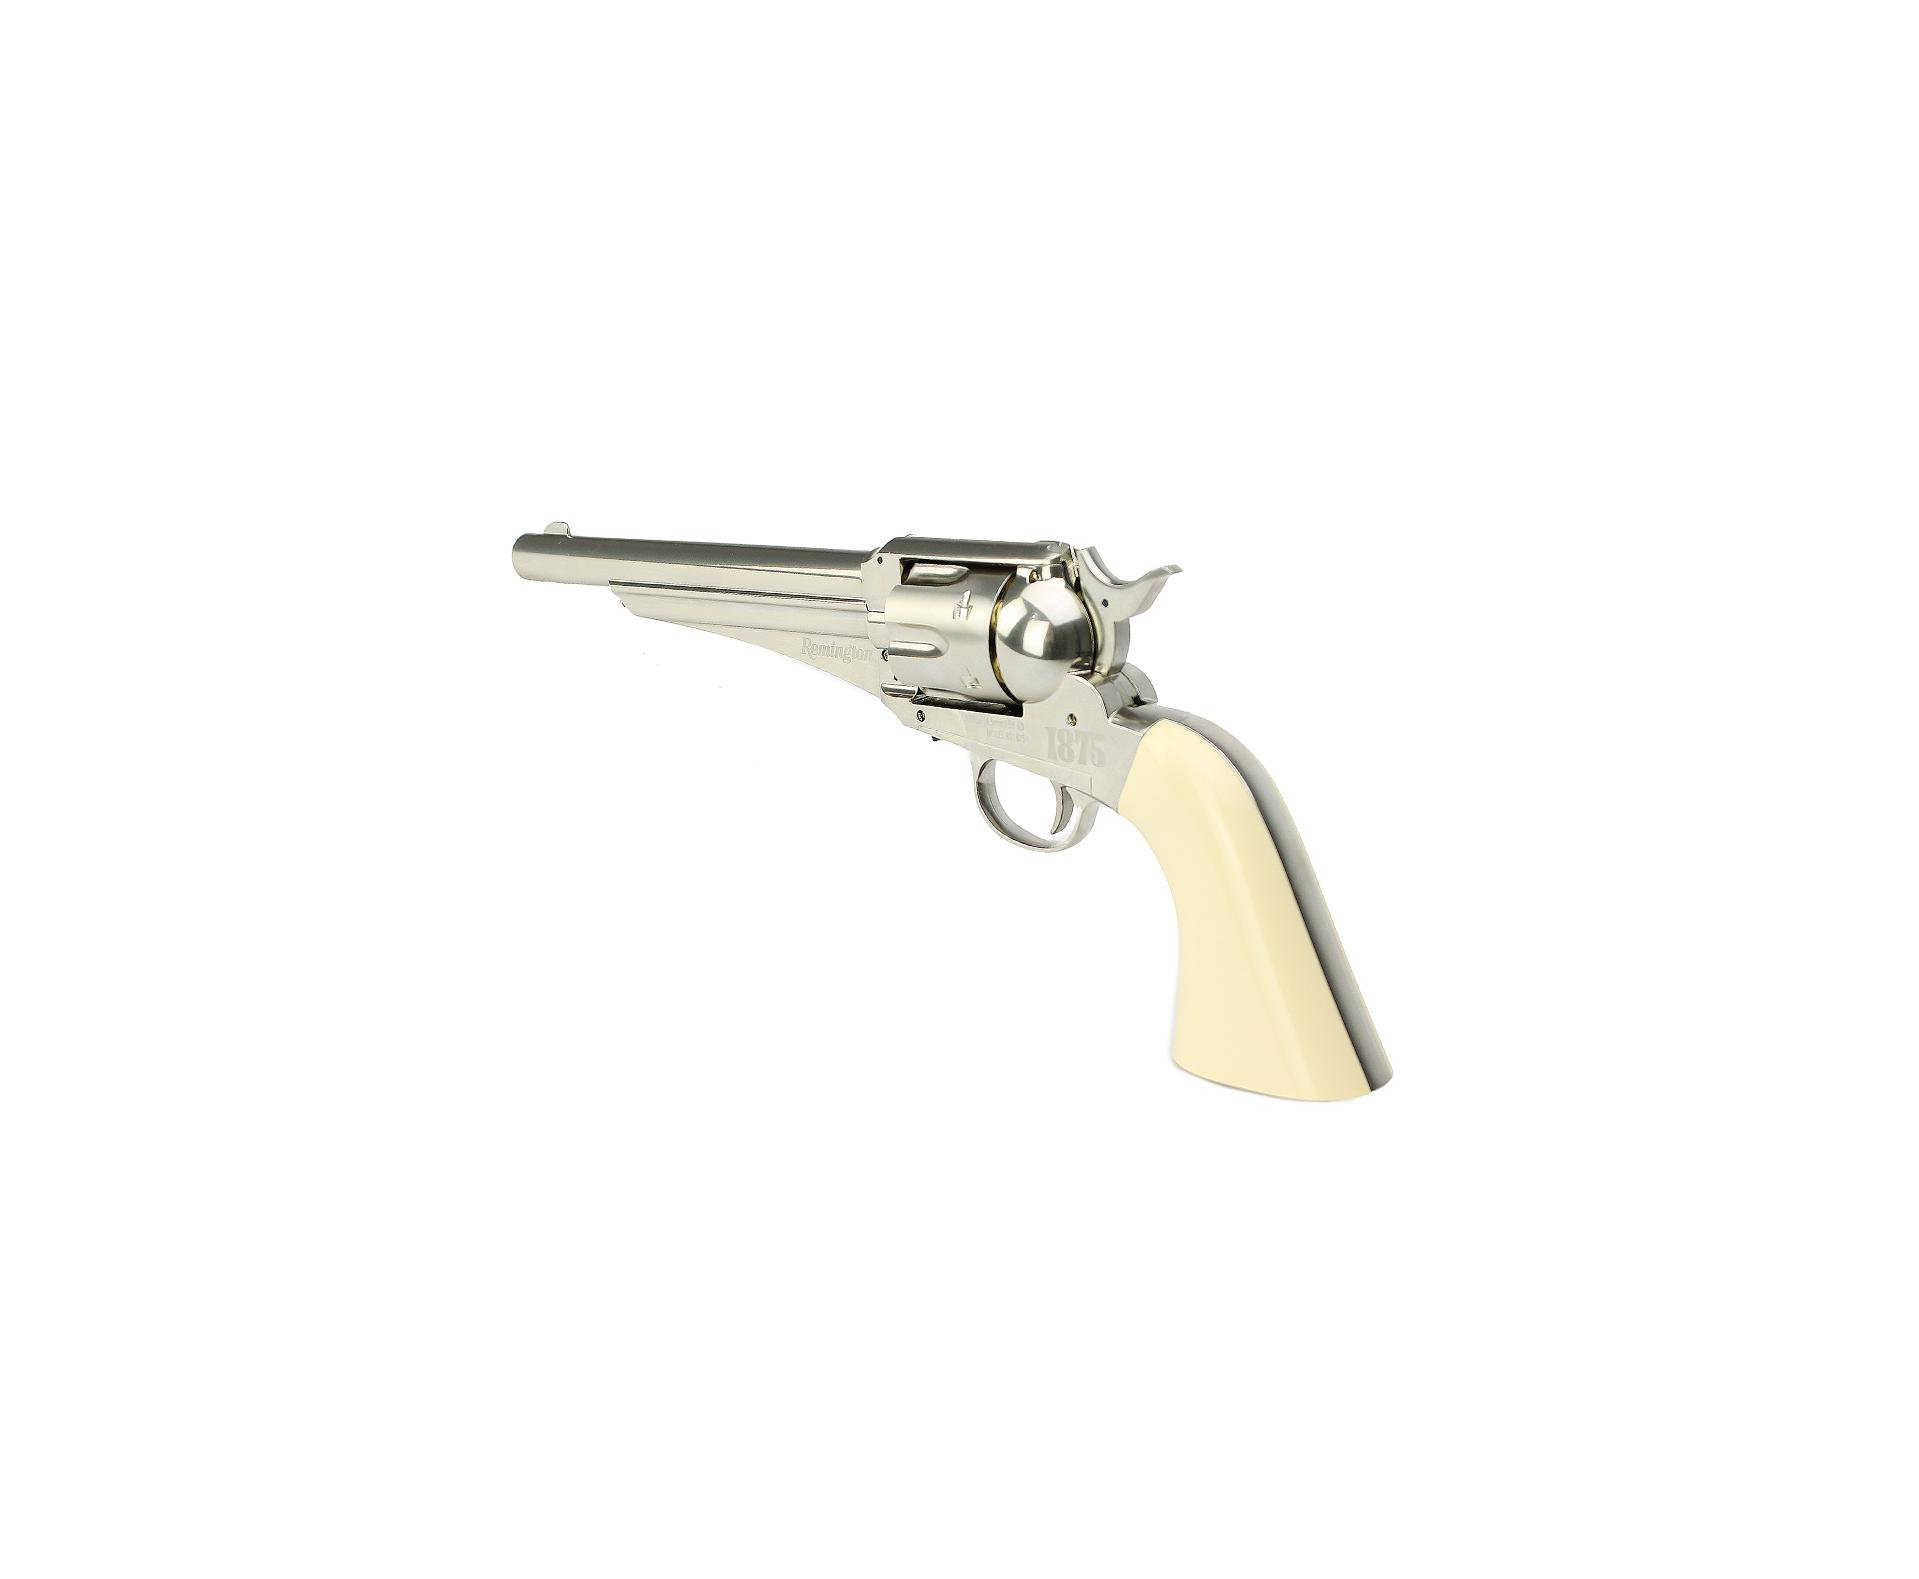 "Revolver Co2 Remington Rr1875 Full Metal 6"" Cano Cal 4,5mm"